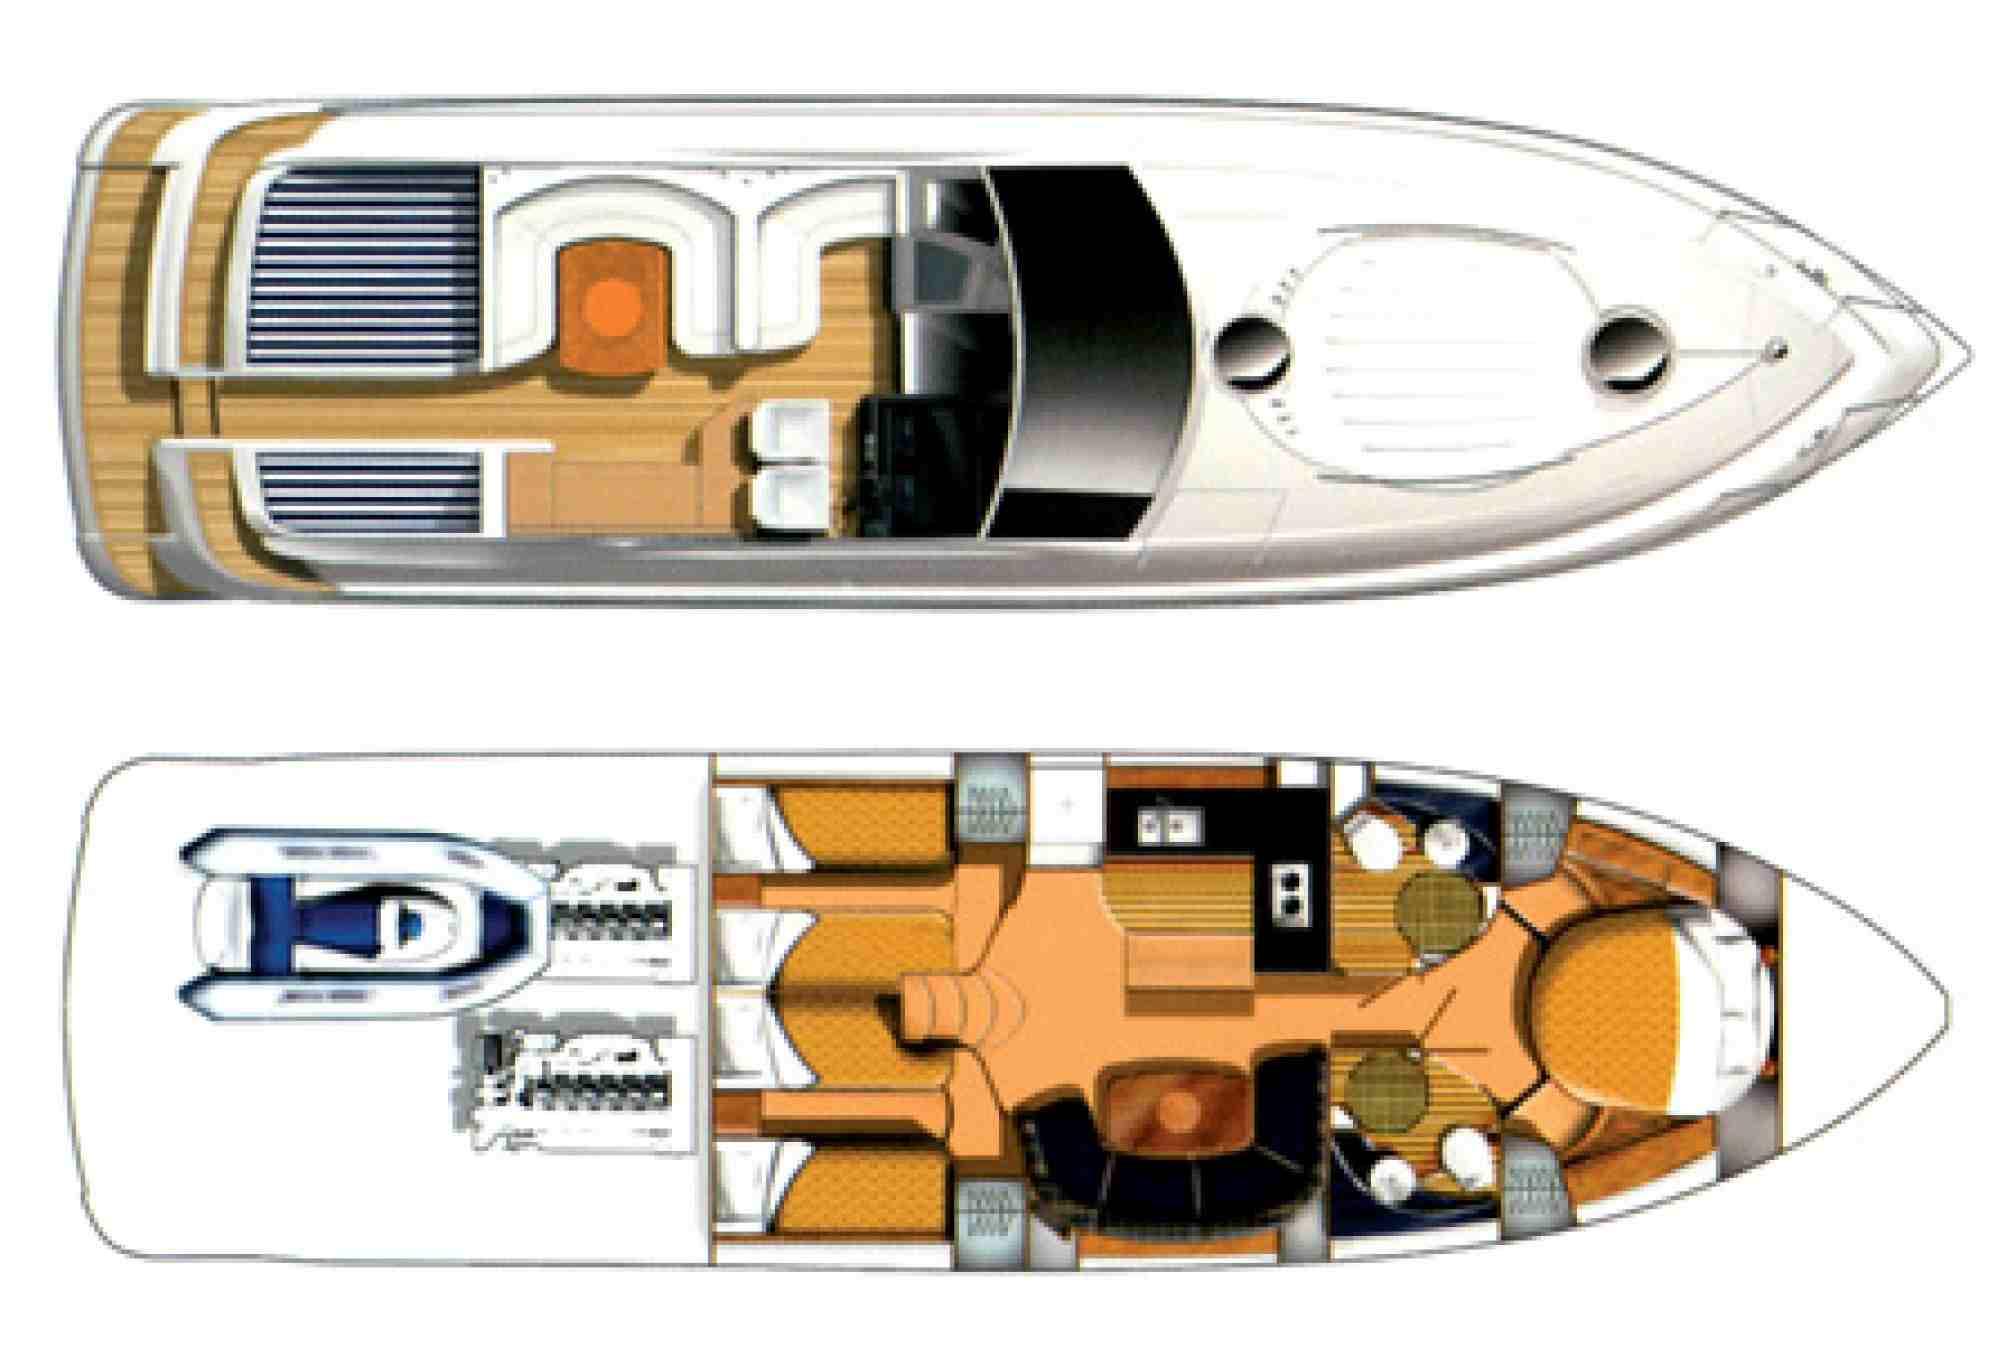 TARGA 52 GT motorboat charter layout